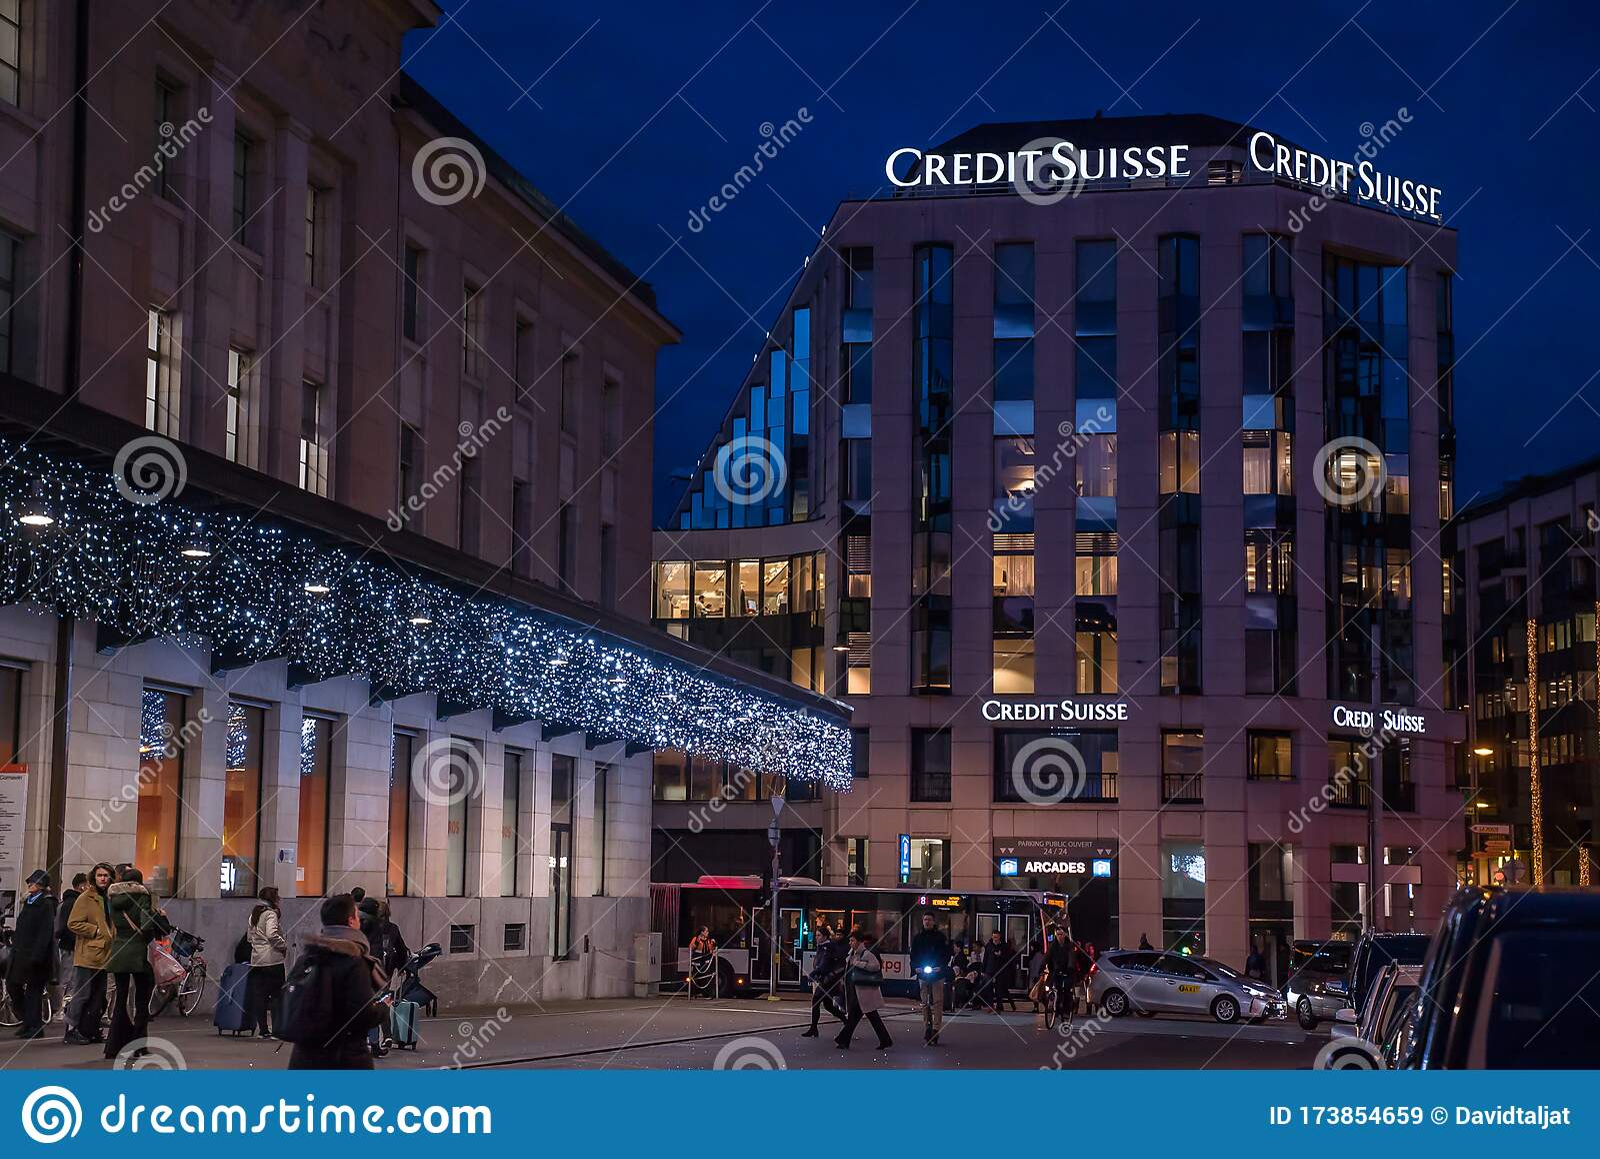 Credit Suisse in Geneva editorial stock image. Image of management ...